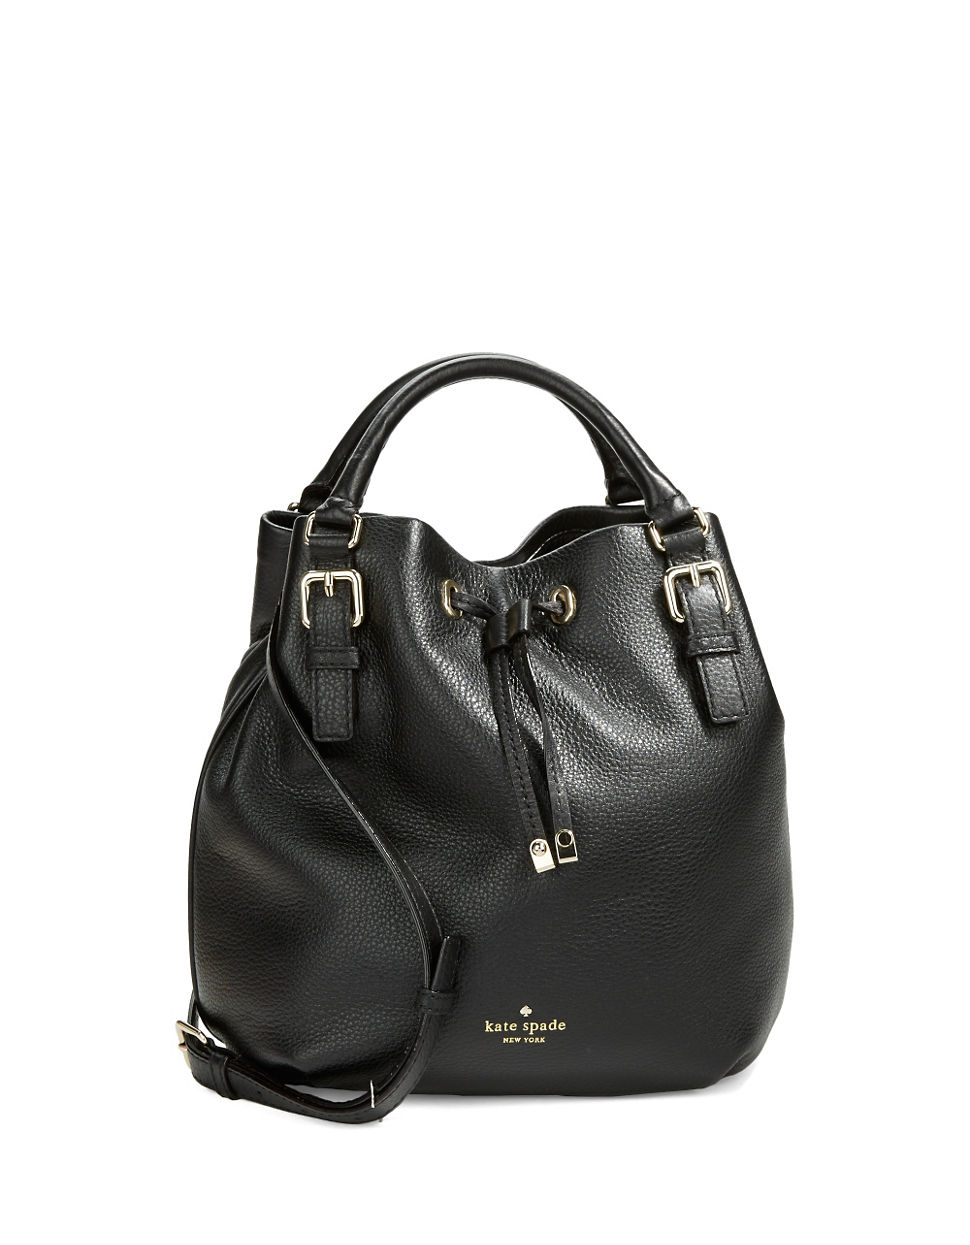 Kate Spade New York Cobble Hill Sandy Bucket Bag In Black